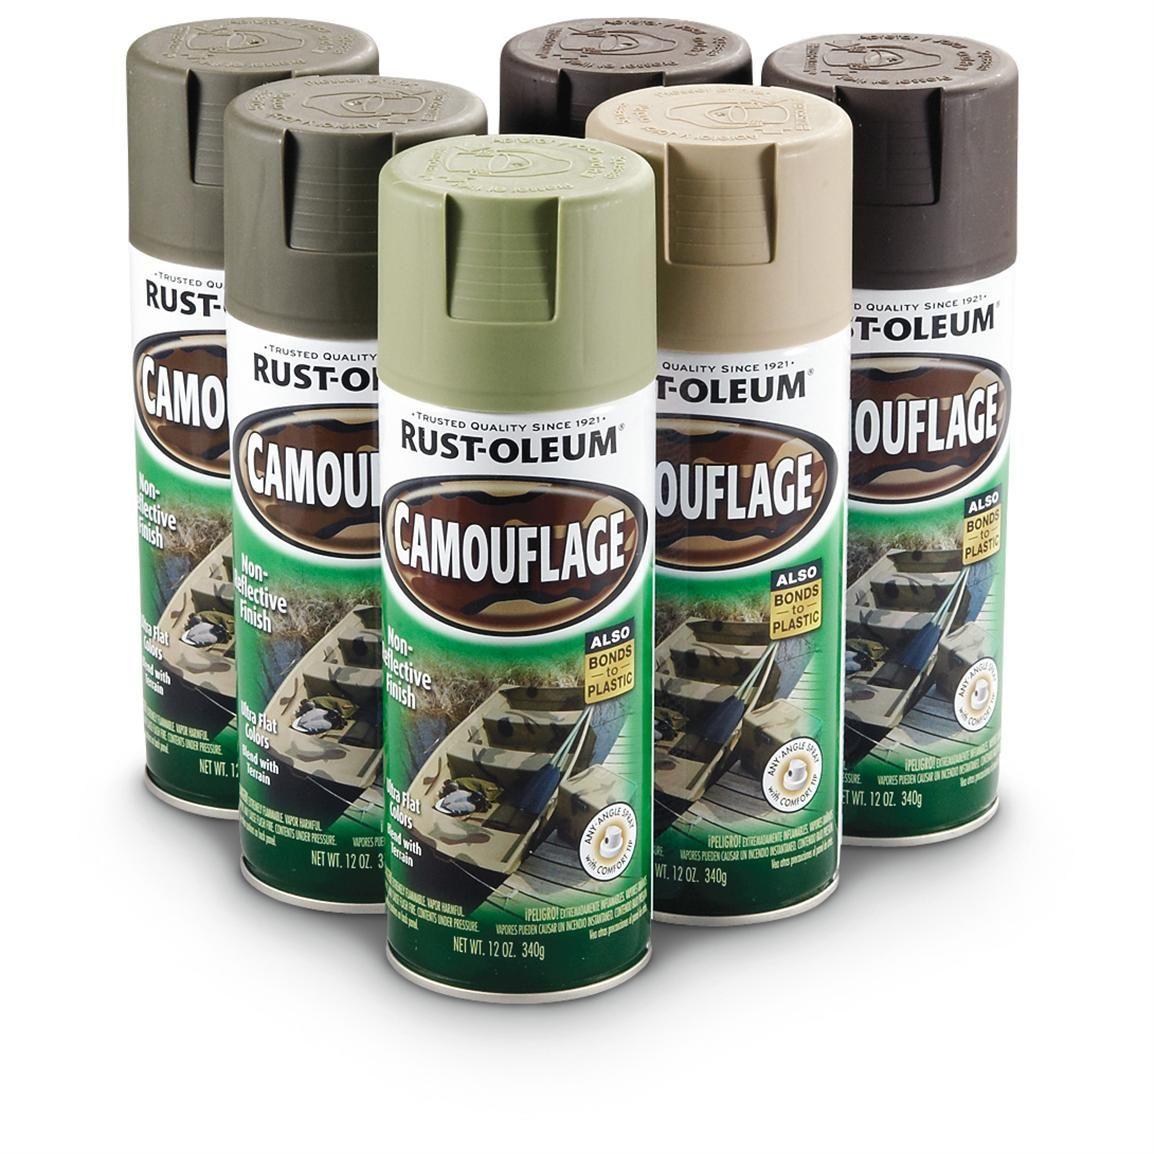 camouflage bedroom accessories | pc rustoleum camo paint kit save ...